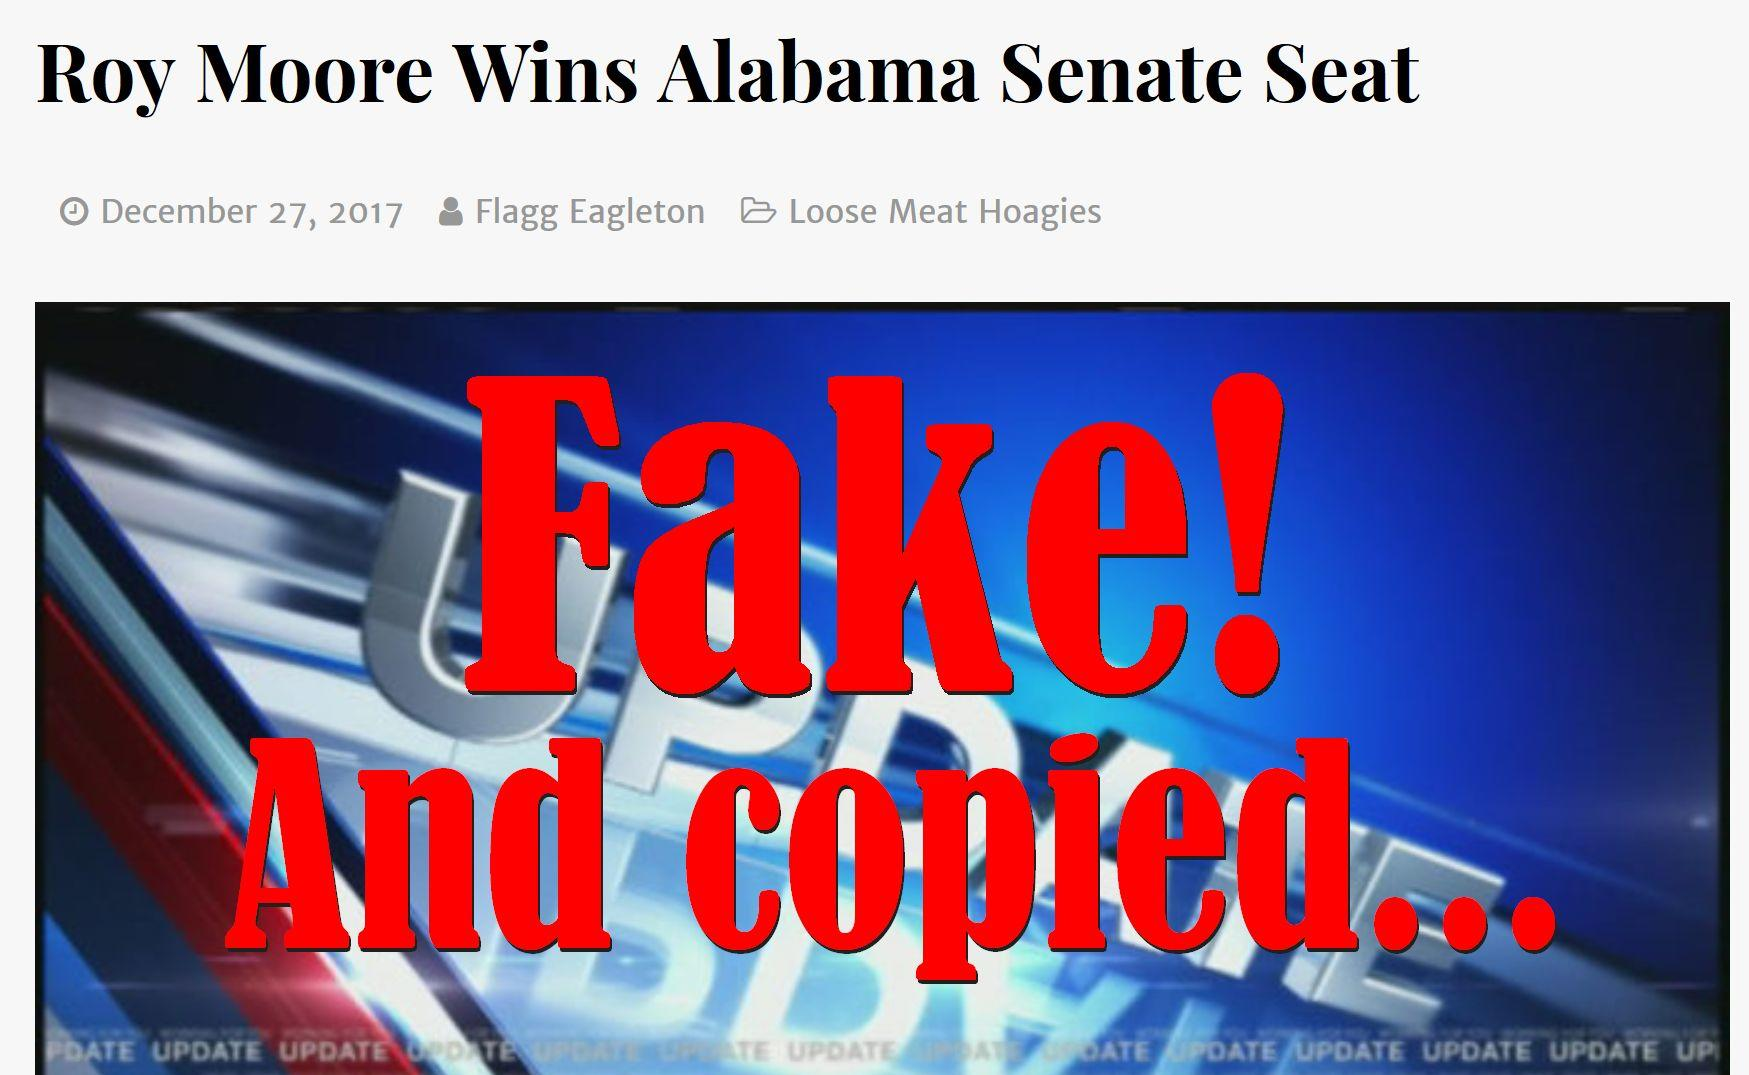 Fake News: Roy Moore Did NOT Win Alabama Senate Seat